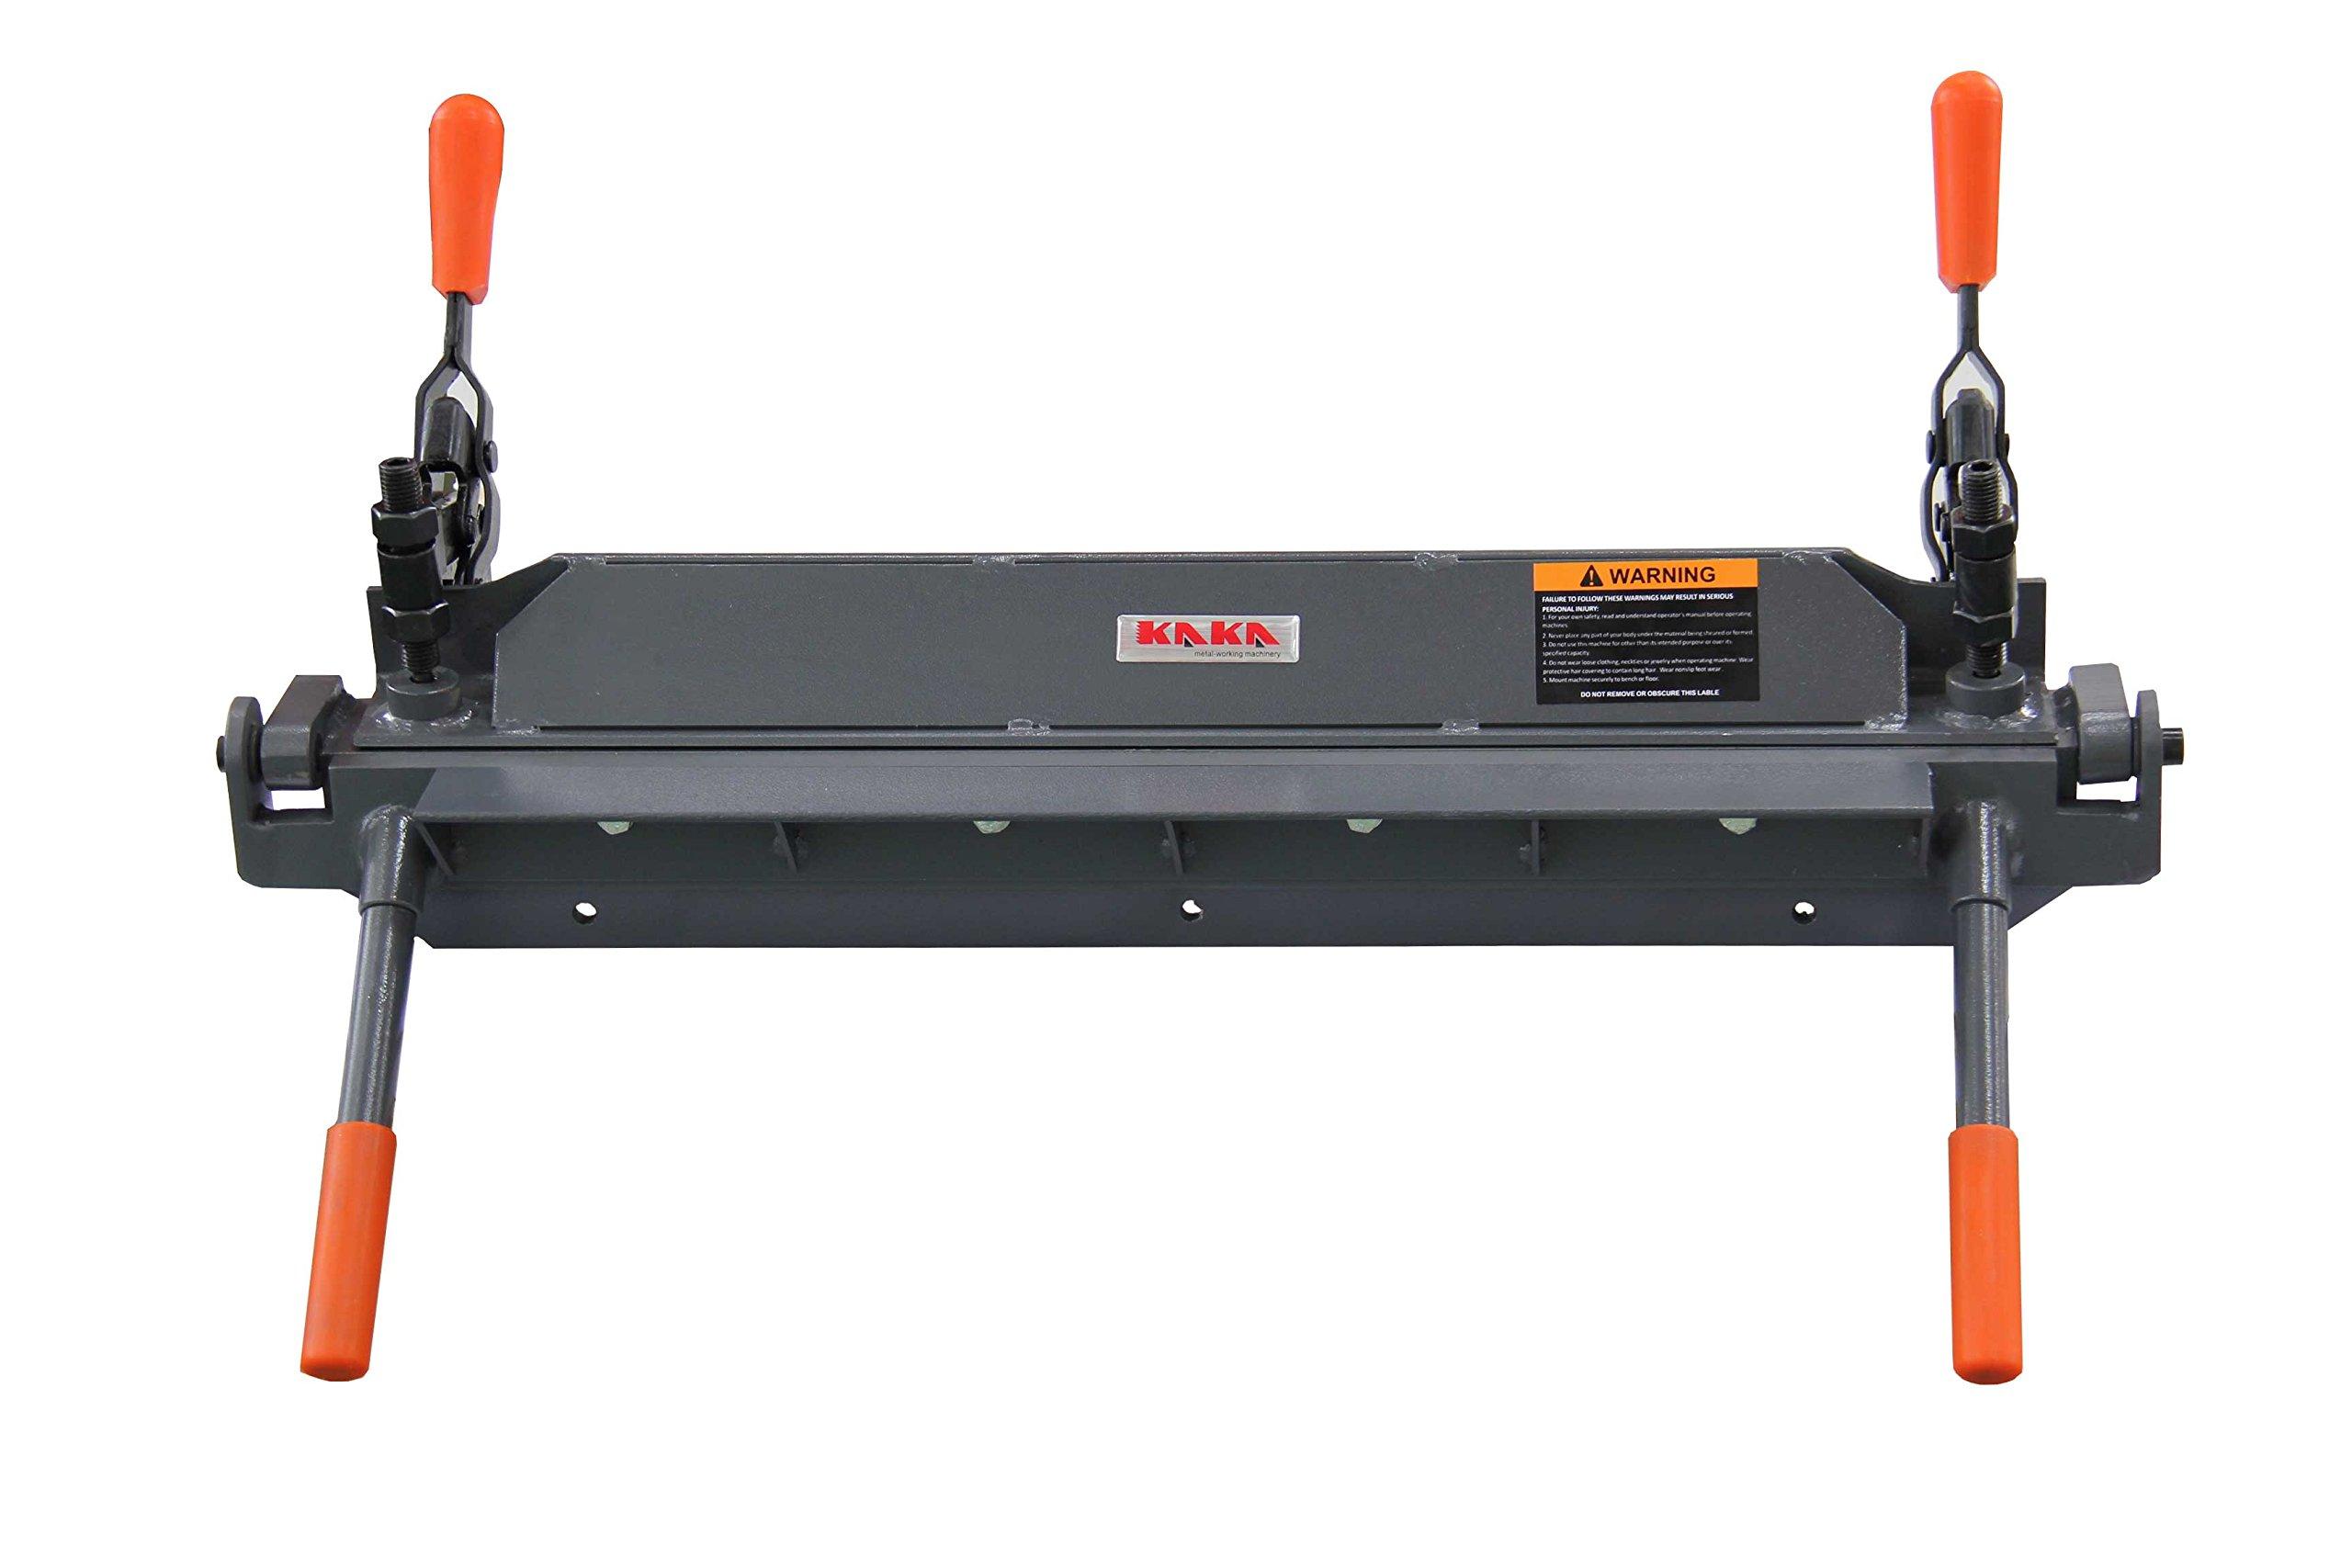 KAKA Industrial W1.2x610 24-Inch Sheet Metal Hand Brake, Solid Sheet Metal Bending Brake, 18 Gauge Mild Steel Capacity